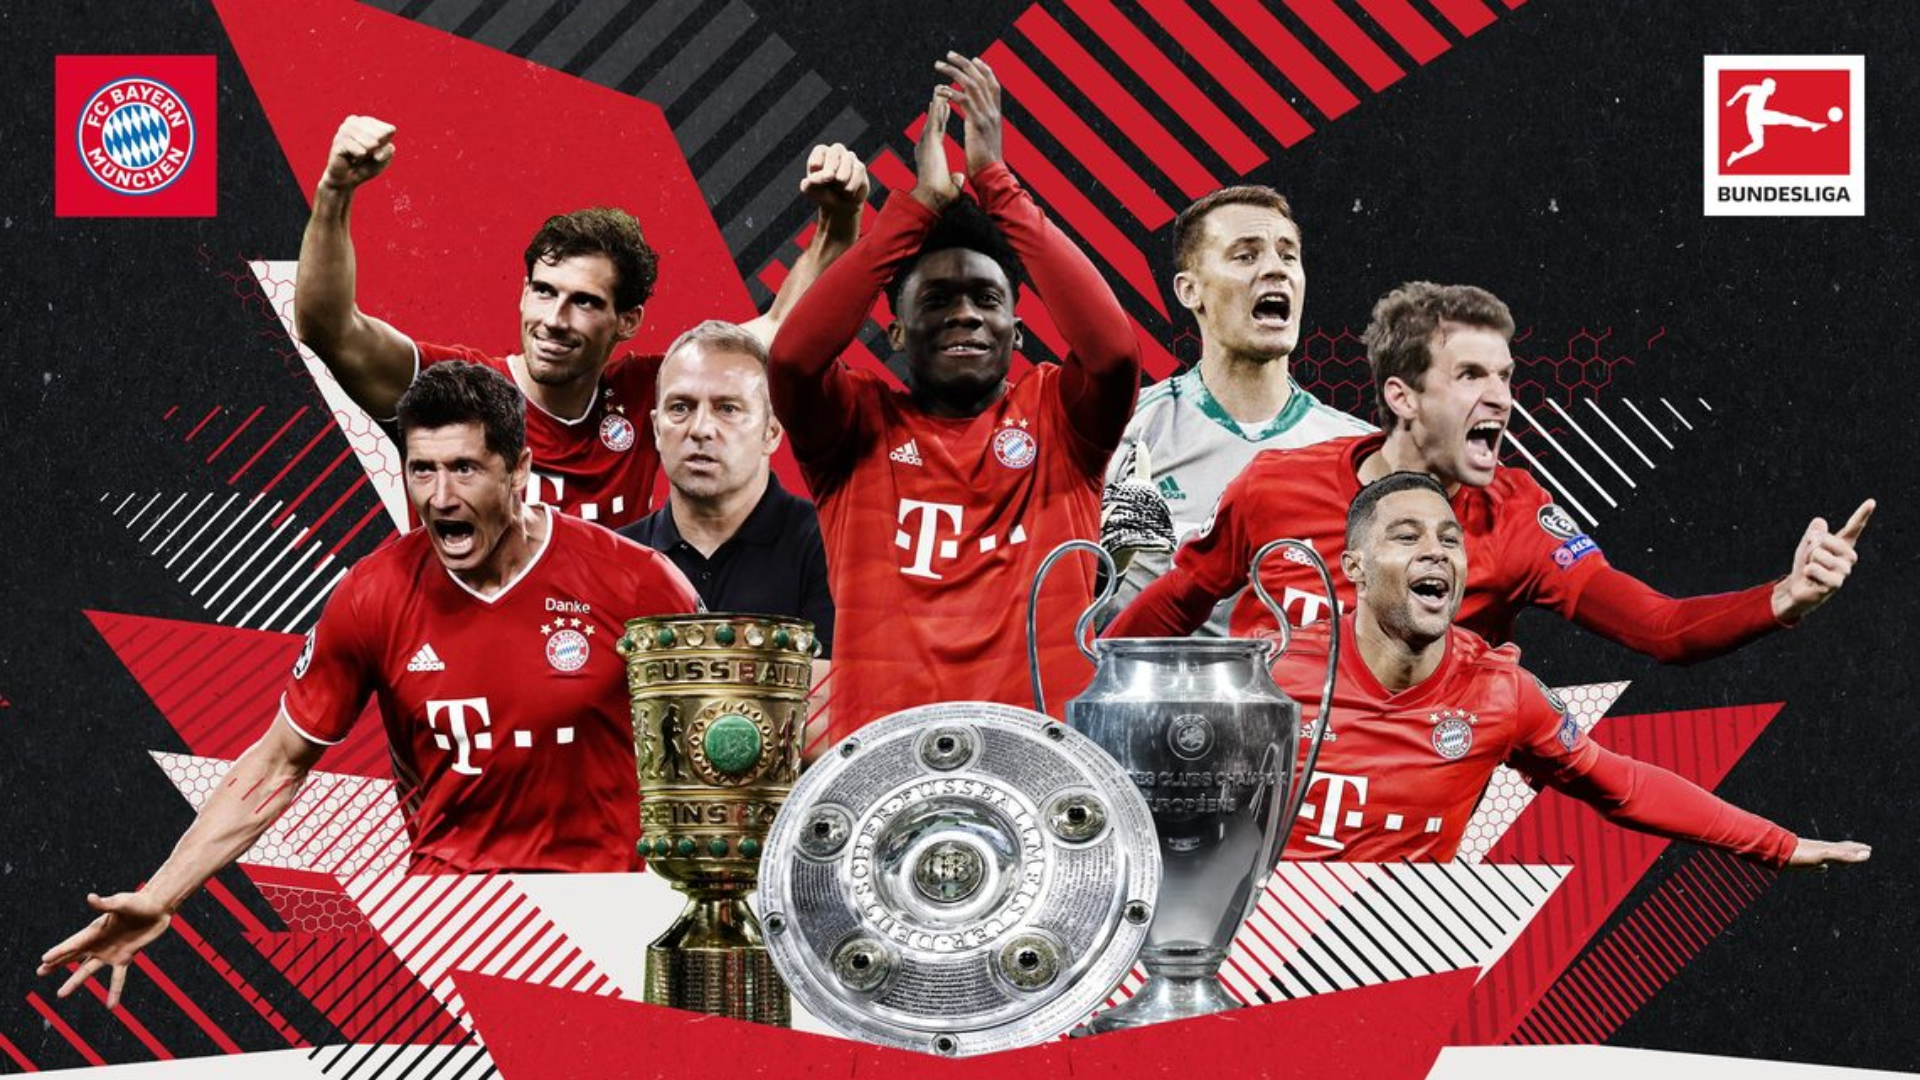 Bundesliga Bayern Munich Seal Treble With Uefa Champions League Final Win Over Psg